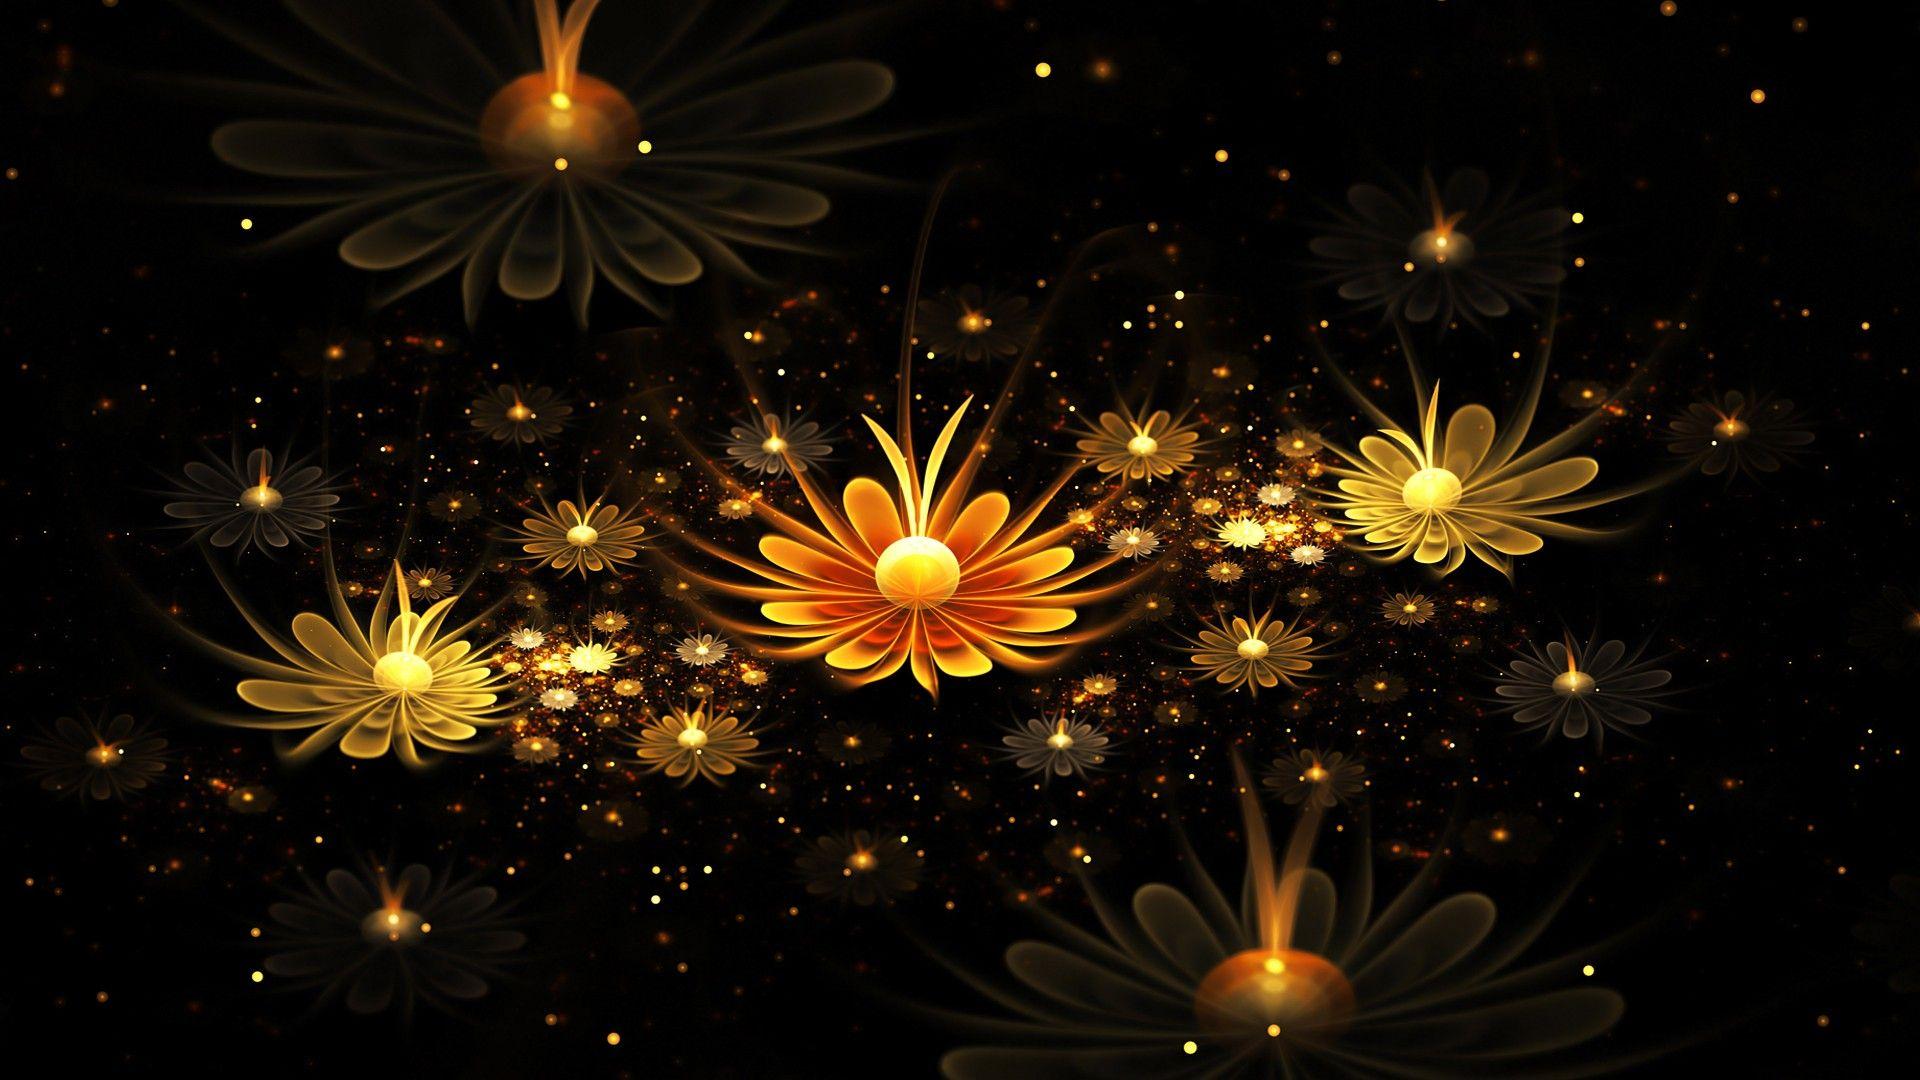 3d Flower Wallpaper Hd Flower Wallpaper Full Hd Desktop